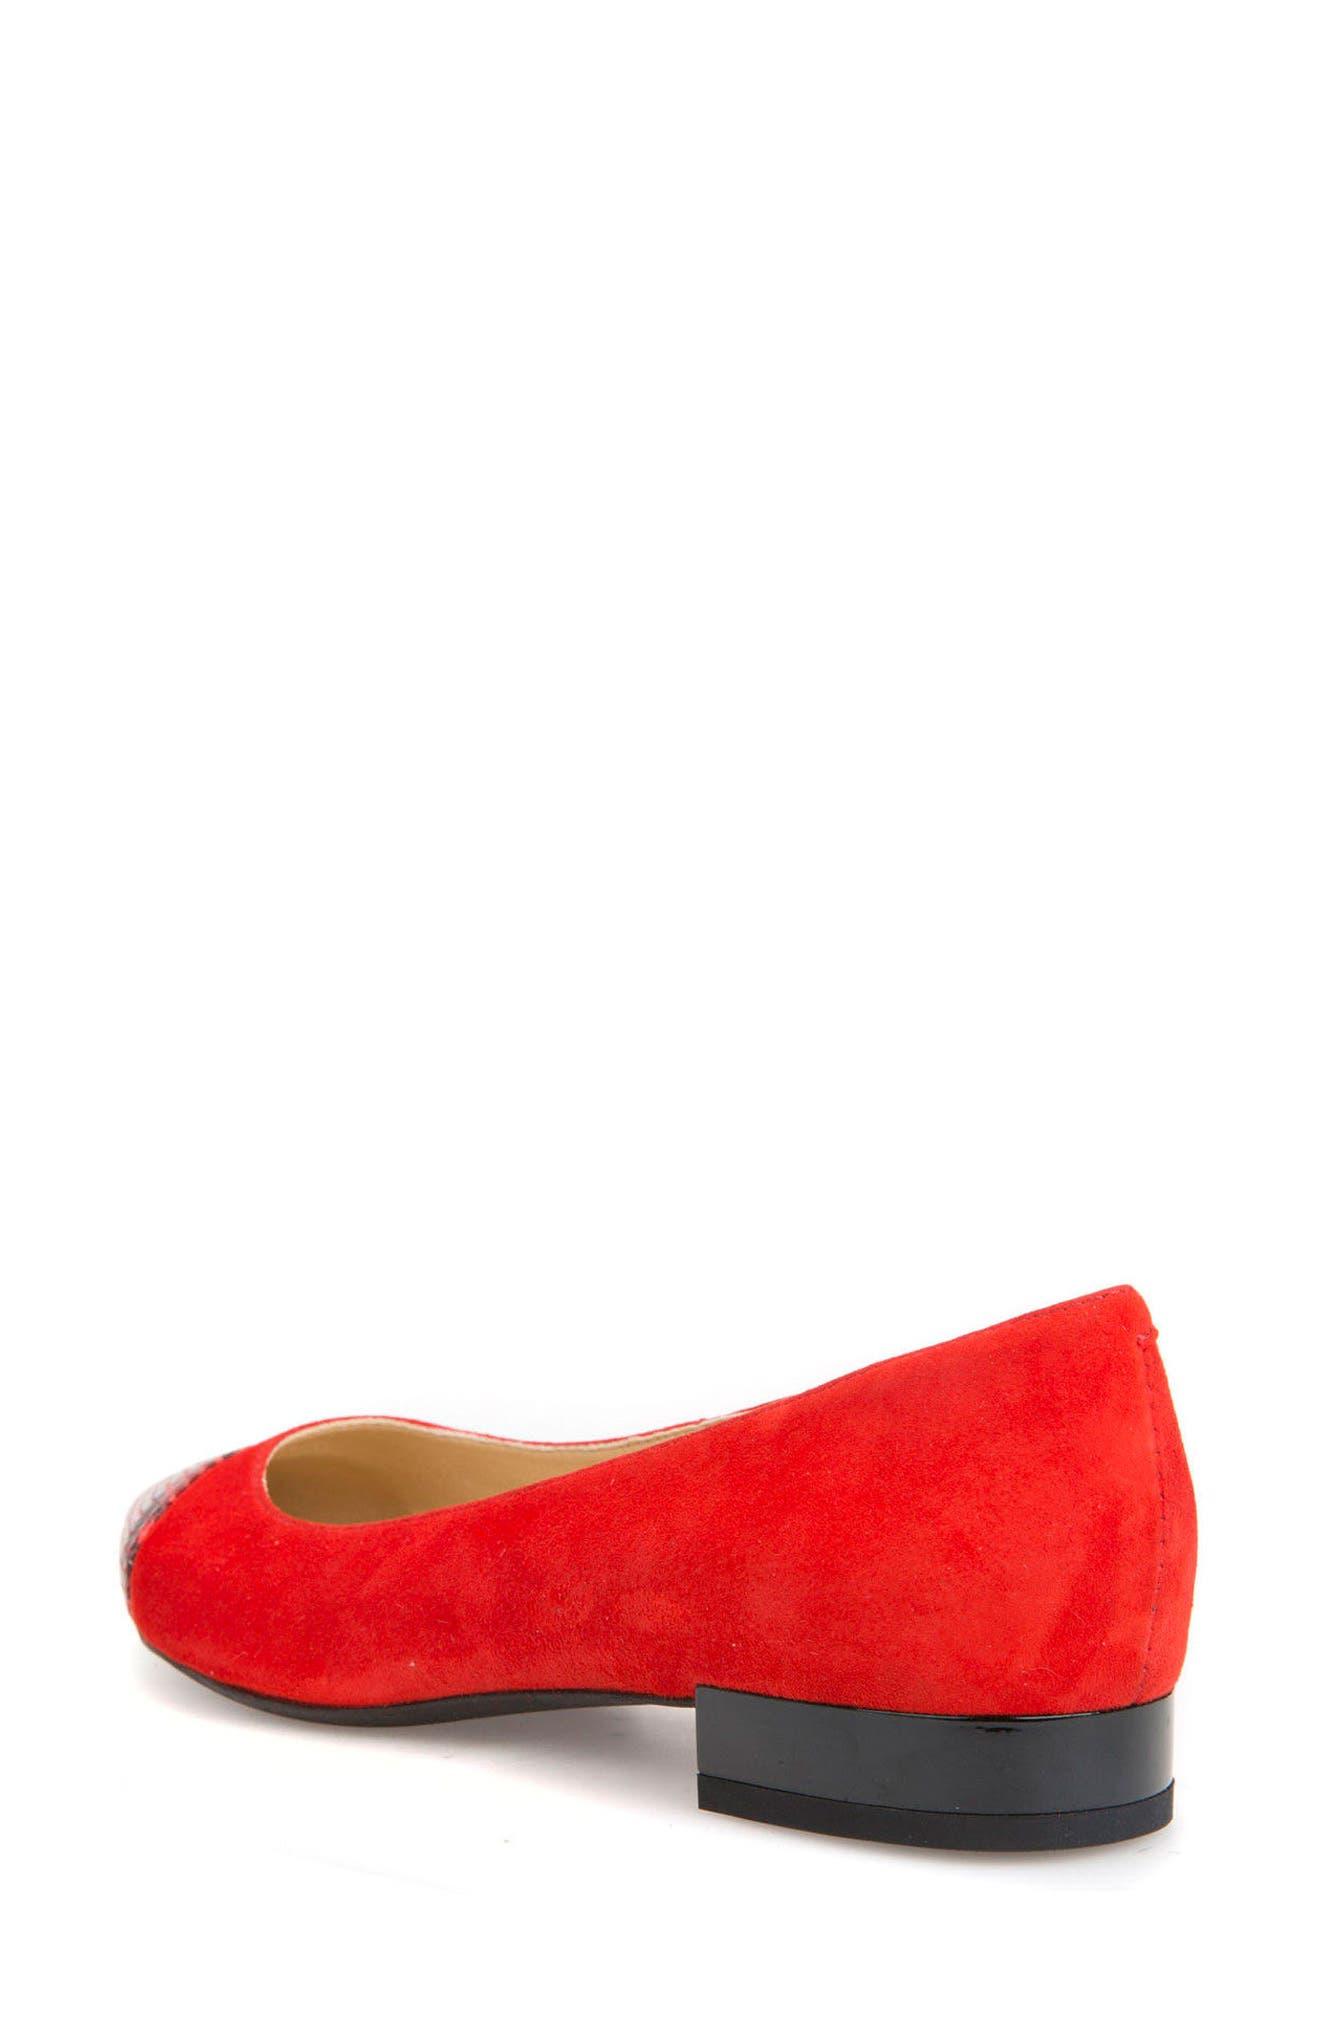 Charyssa Flat,                             Alternate thumbnail 2, color,                             Scarlet Leather